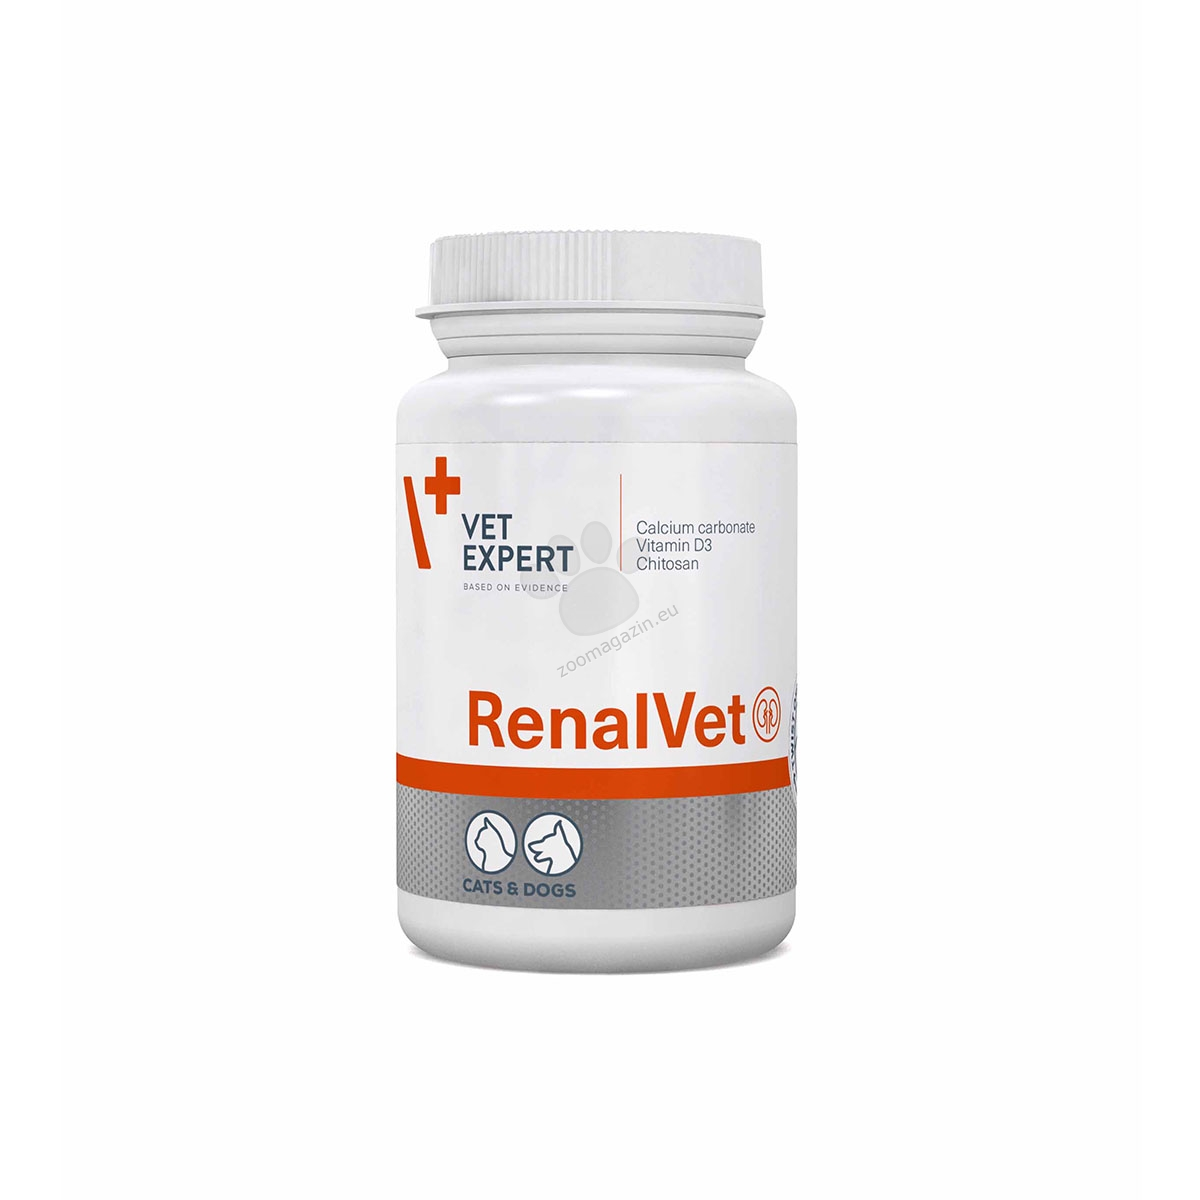 Vetexpert - RenalVet - незаменим помощник при бъбречна недостатъчност 60 табл.